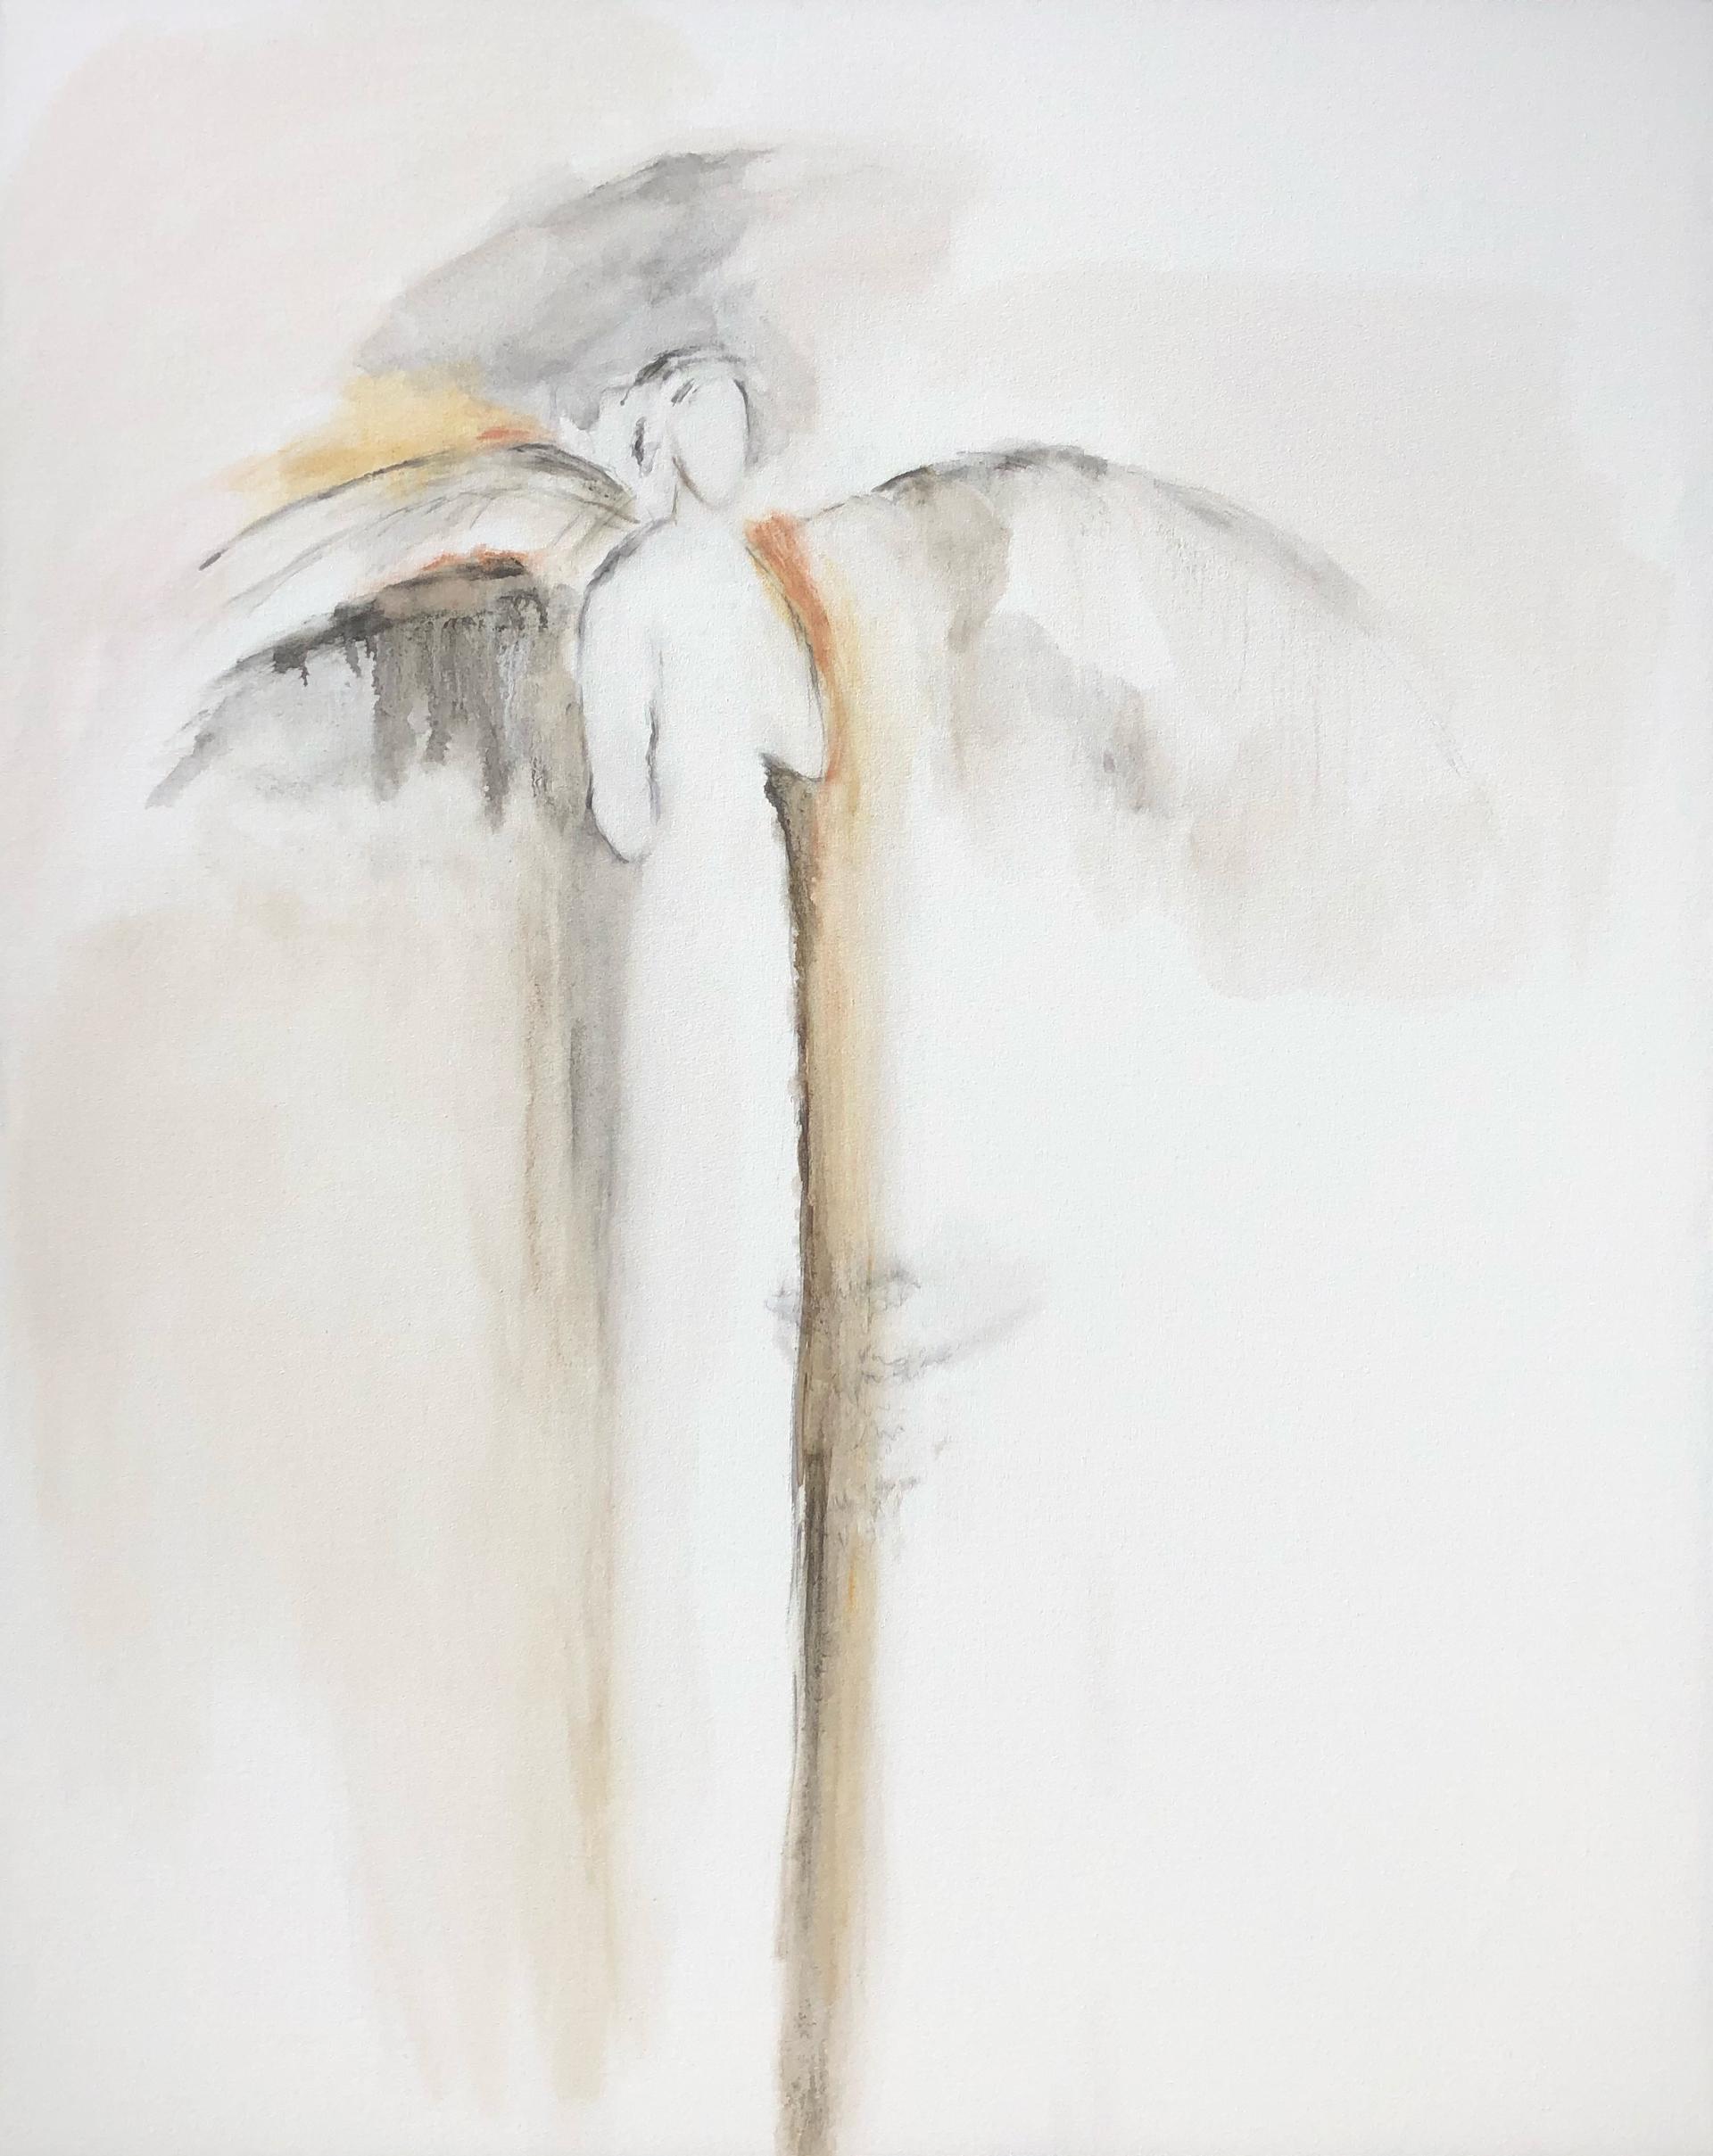 Ezer by Linda James